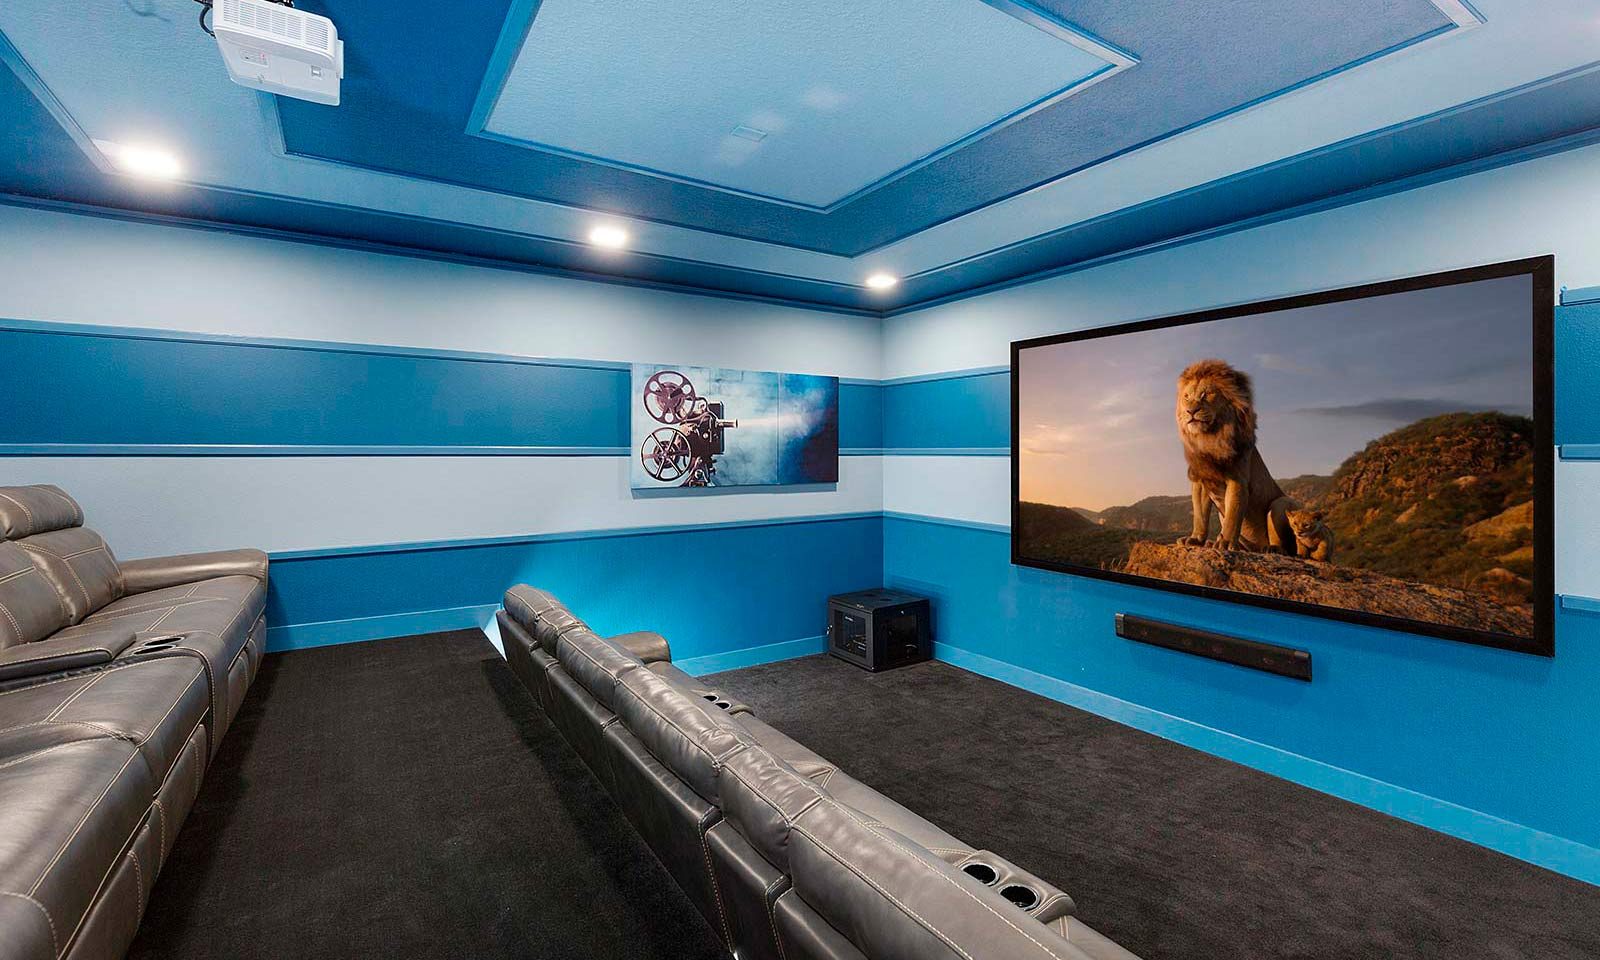 [amenities:Theater-Room:2] Theater Room